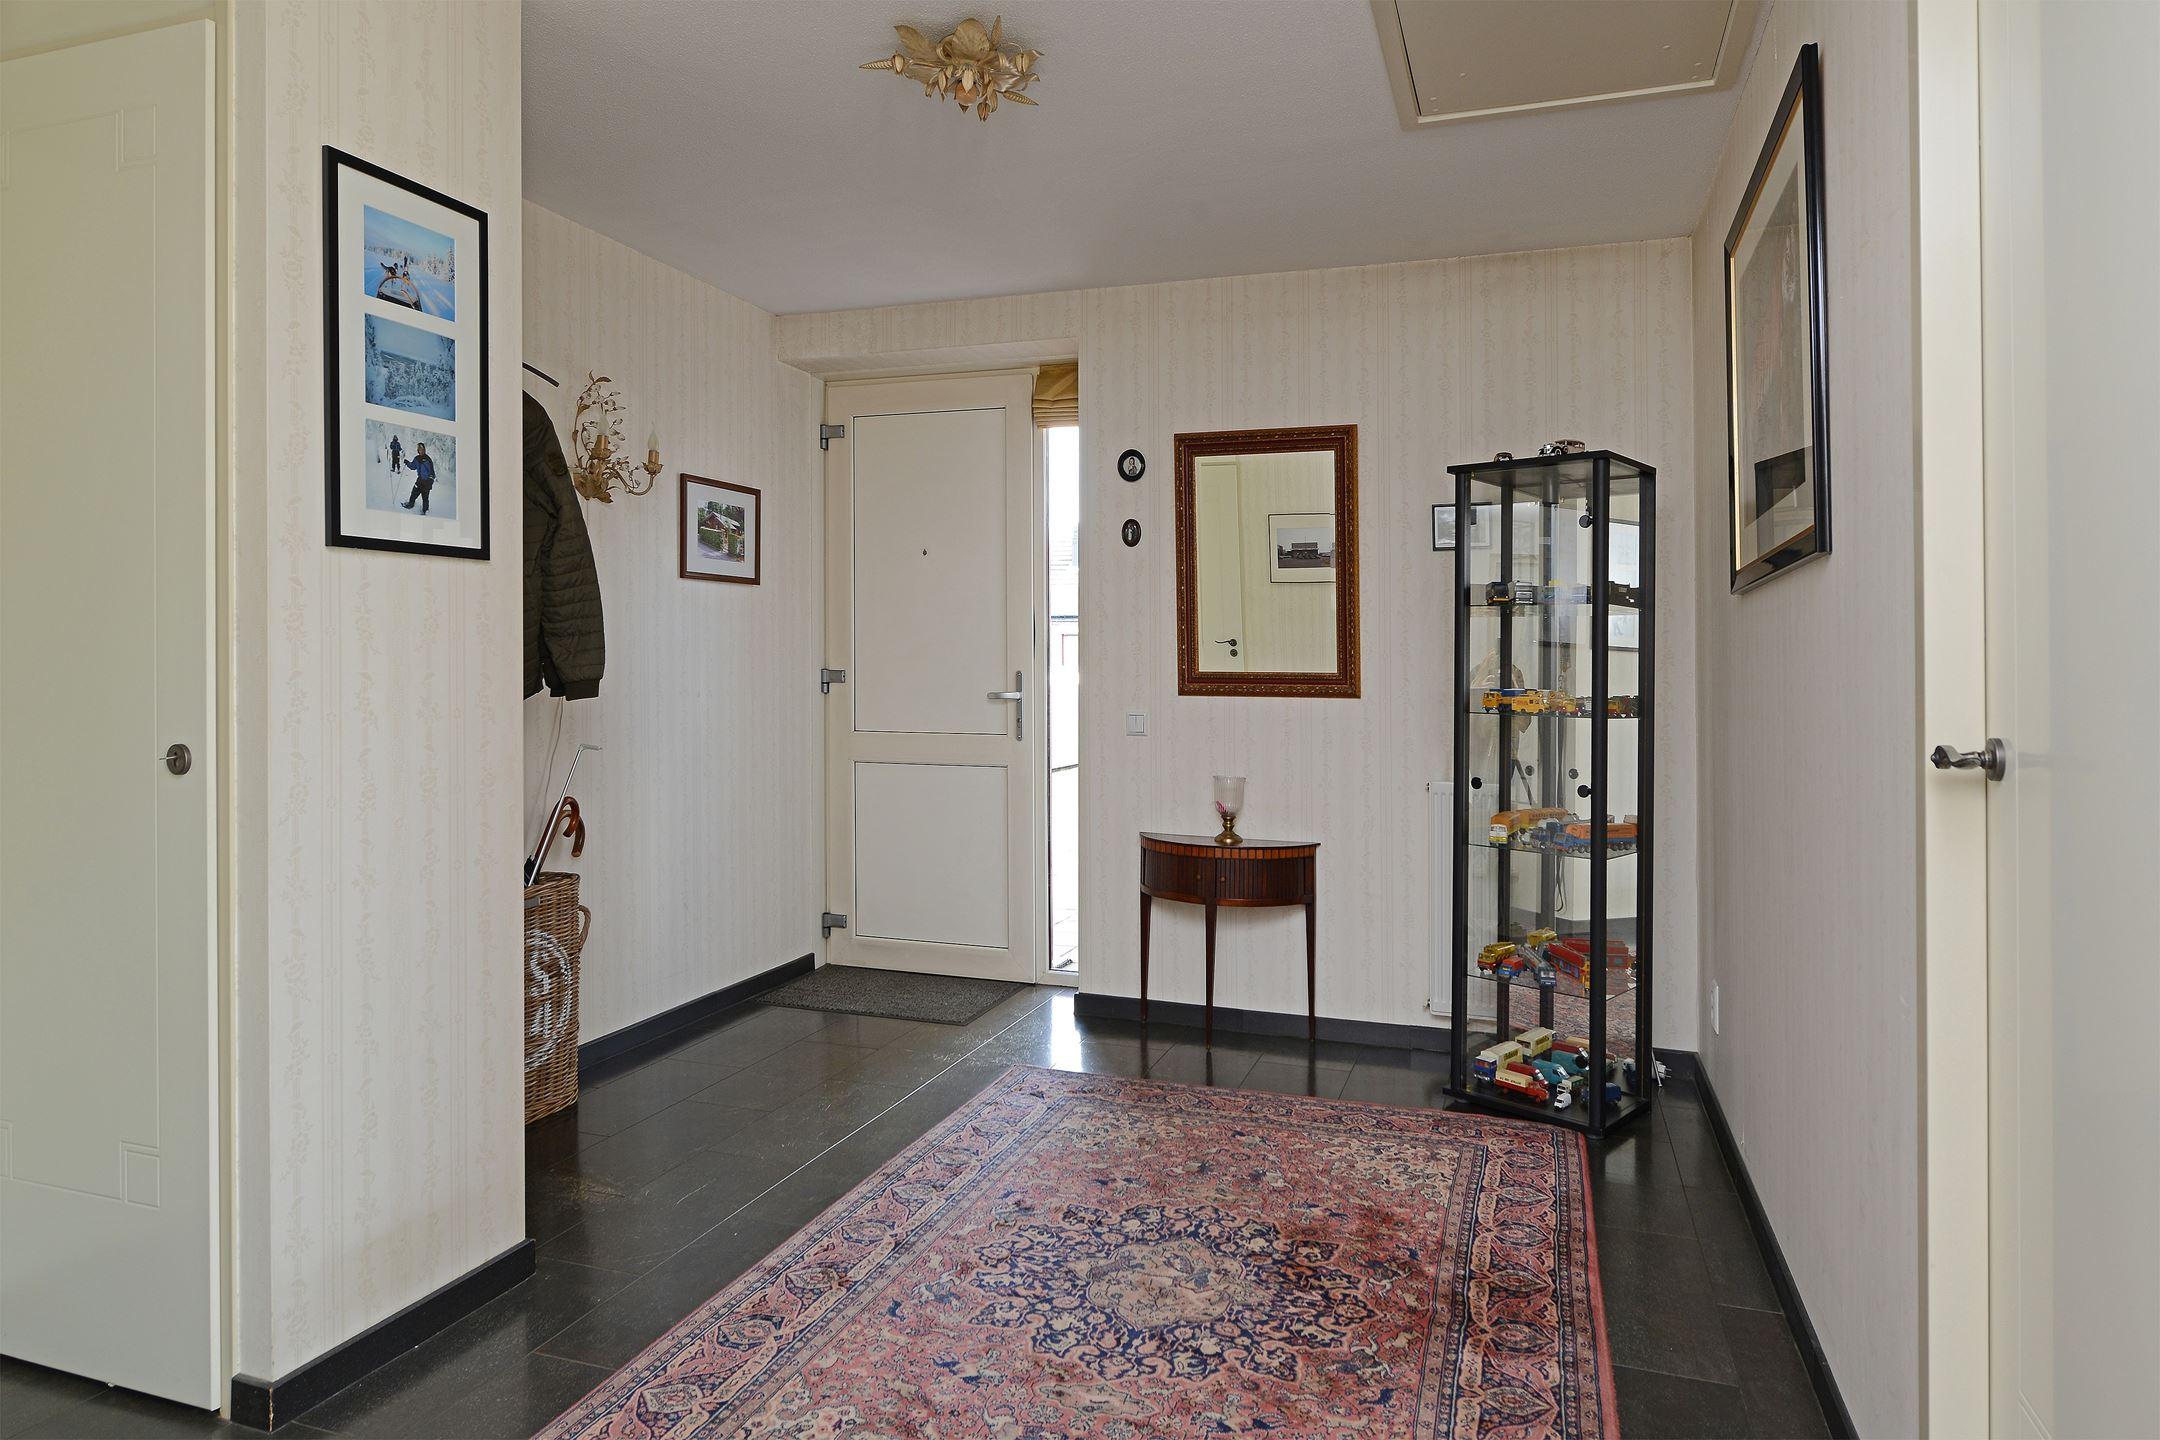 Appartement te koop d hofstedestraat sx ter aar funda